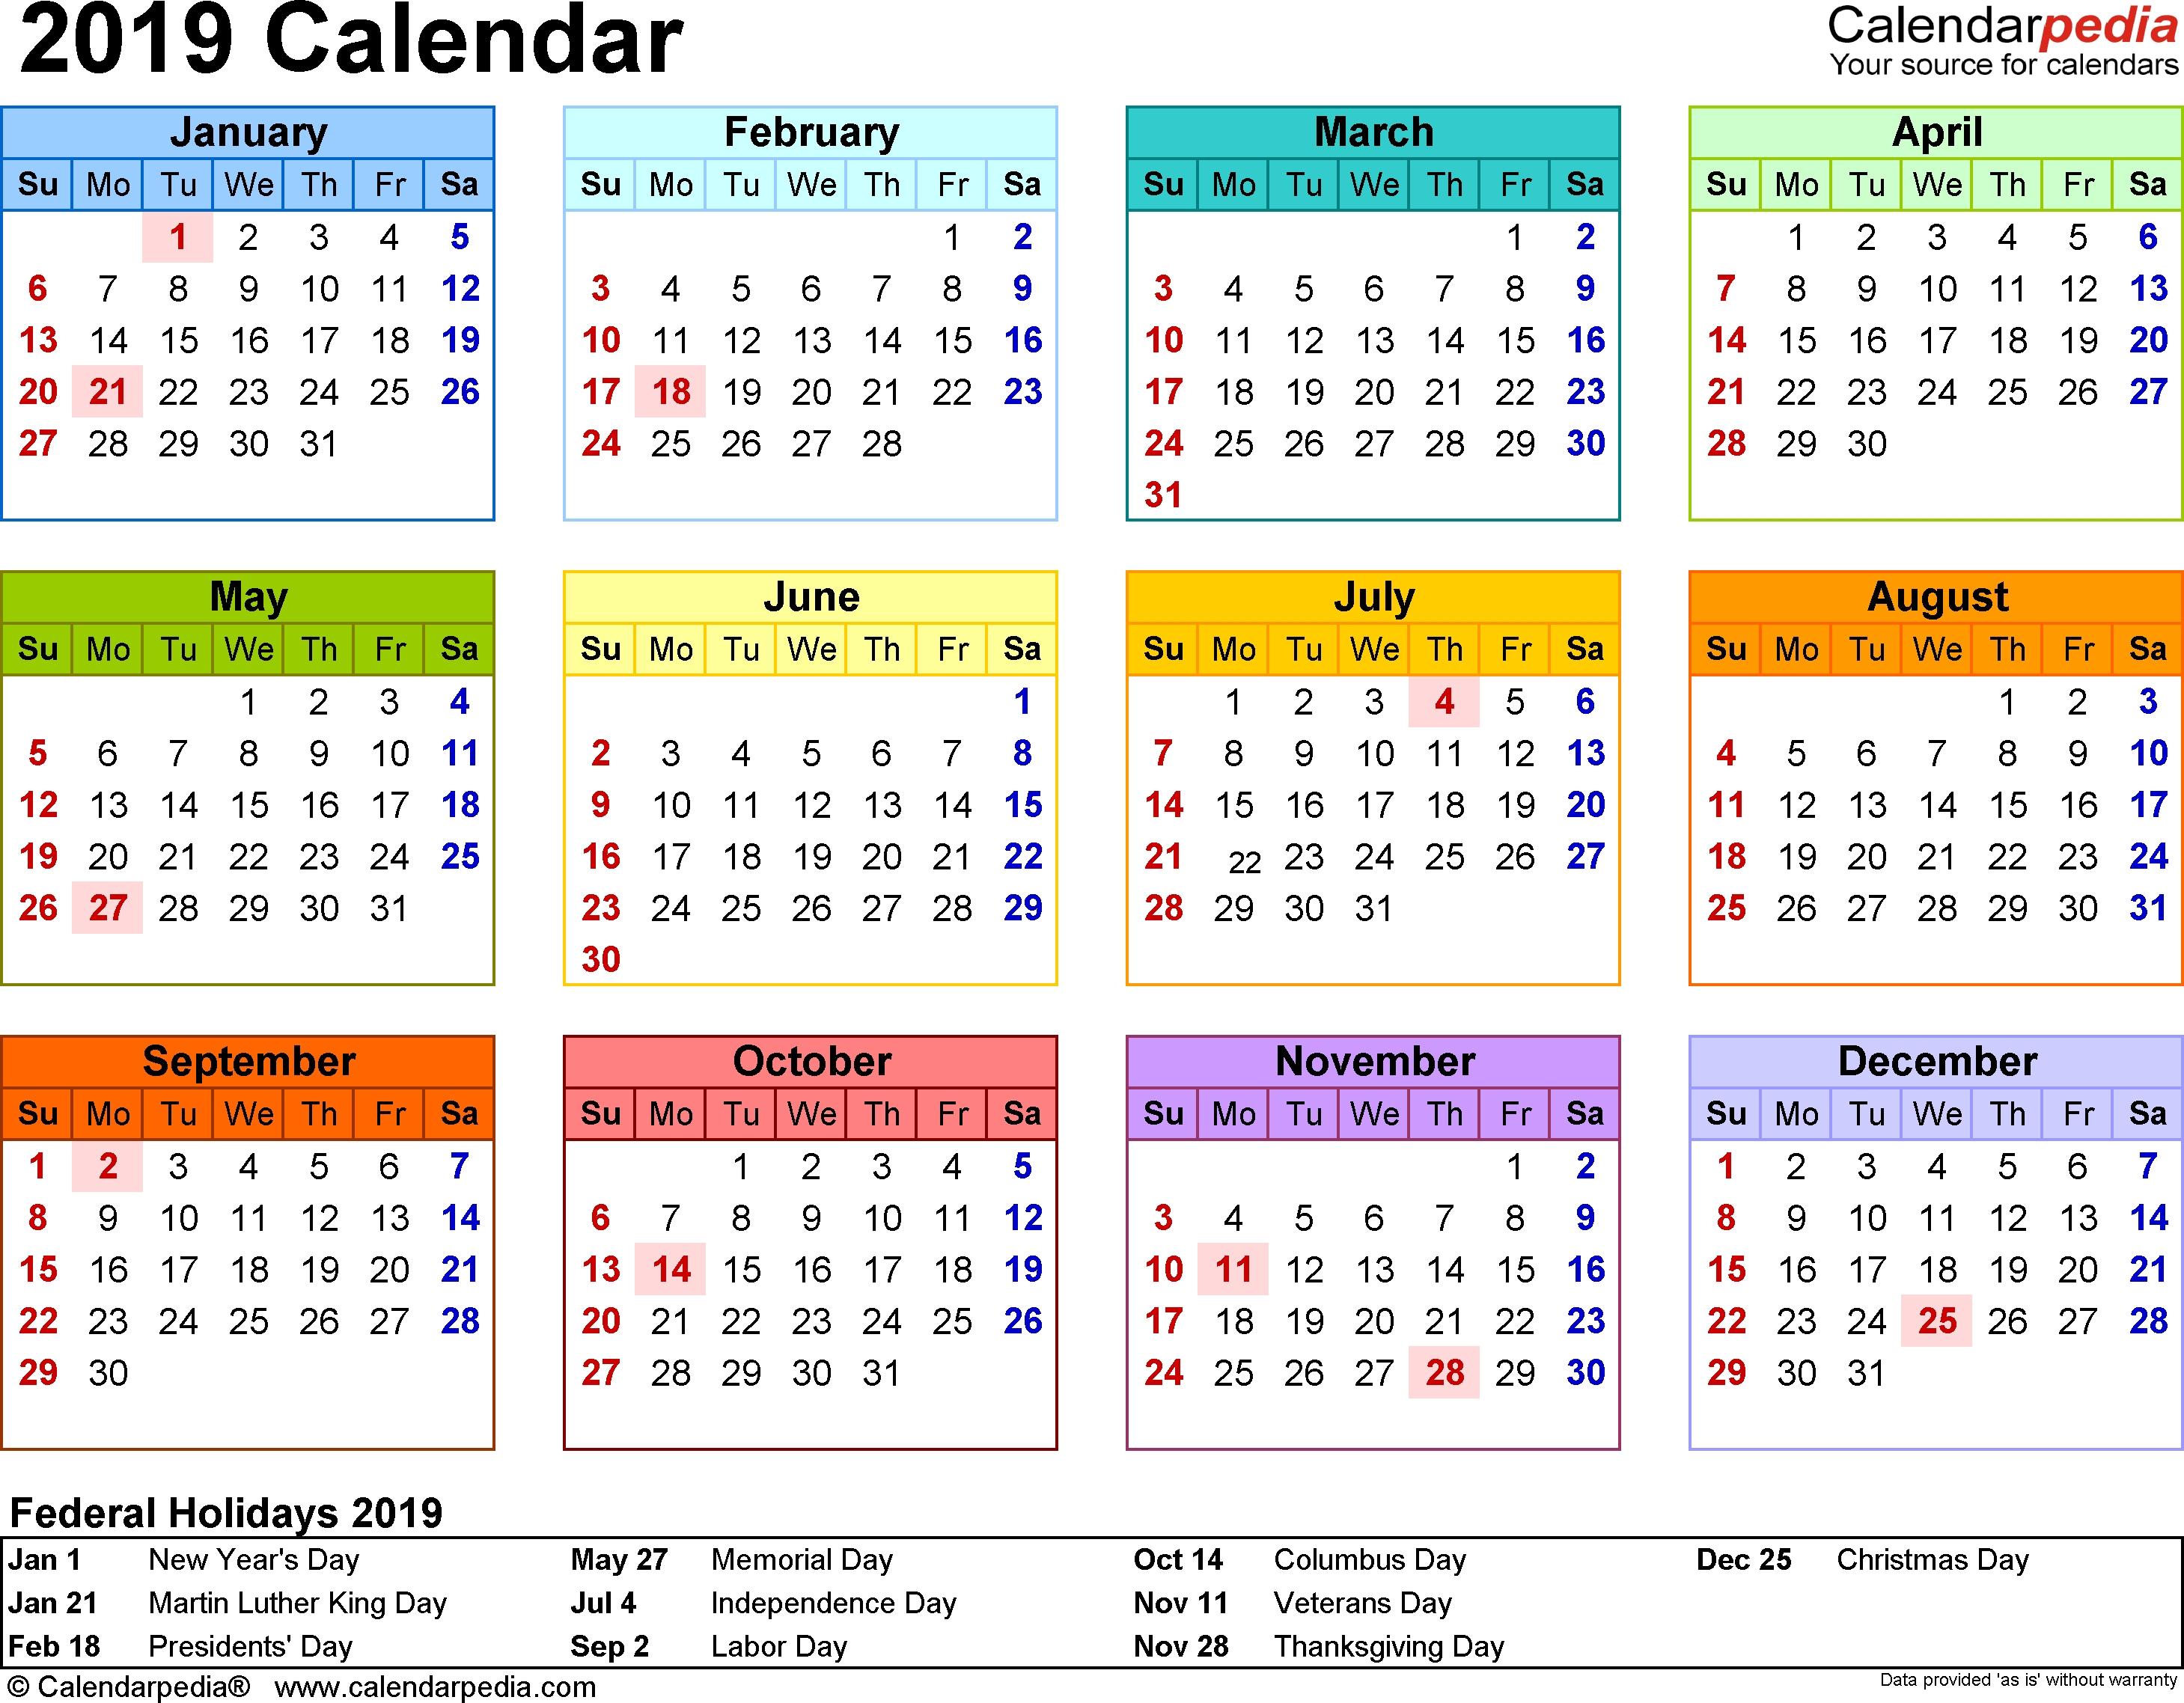 Calendar 365 Holidays 2019 • Printable Blank Calendar Template 2019 Calendar 365